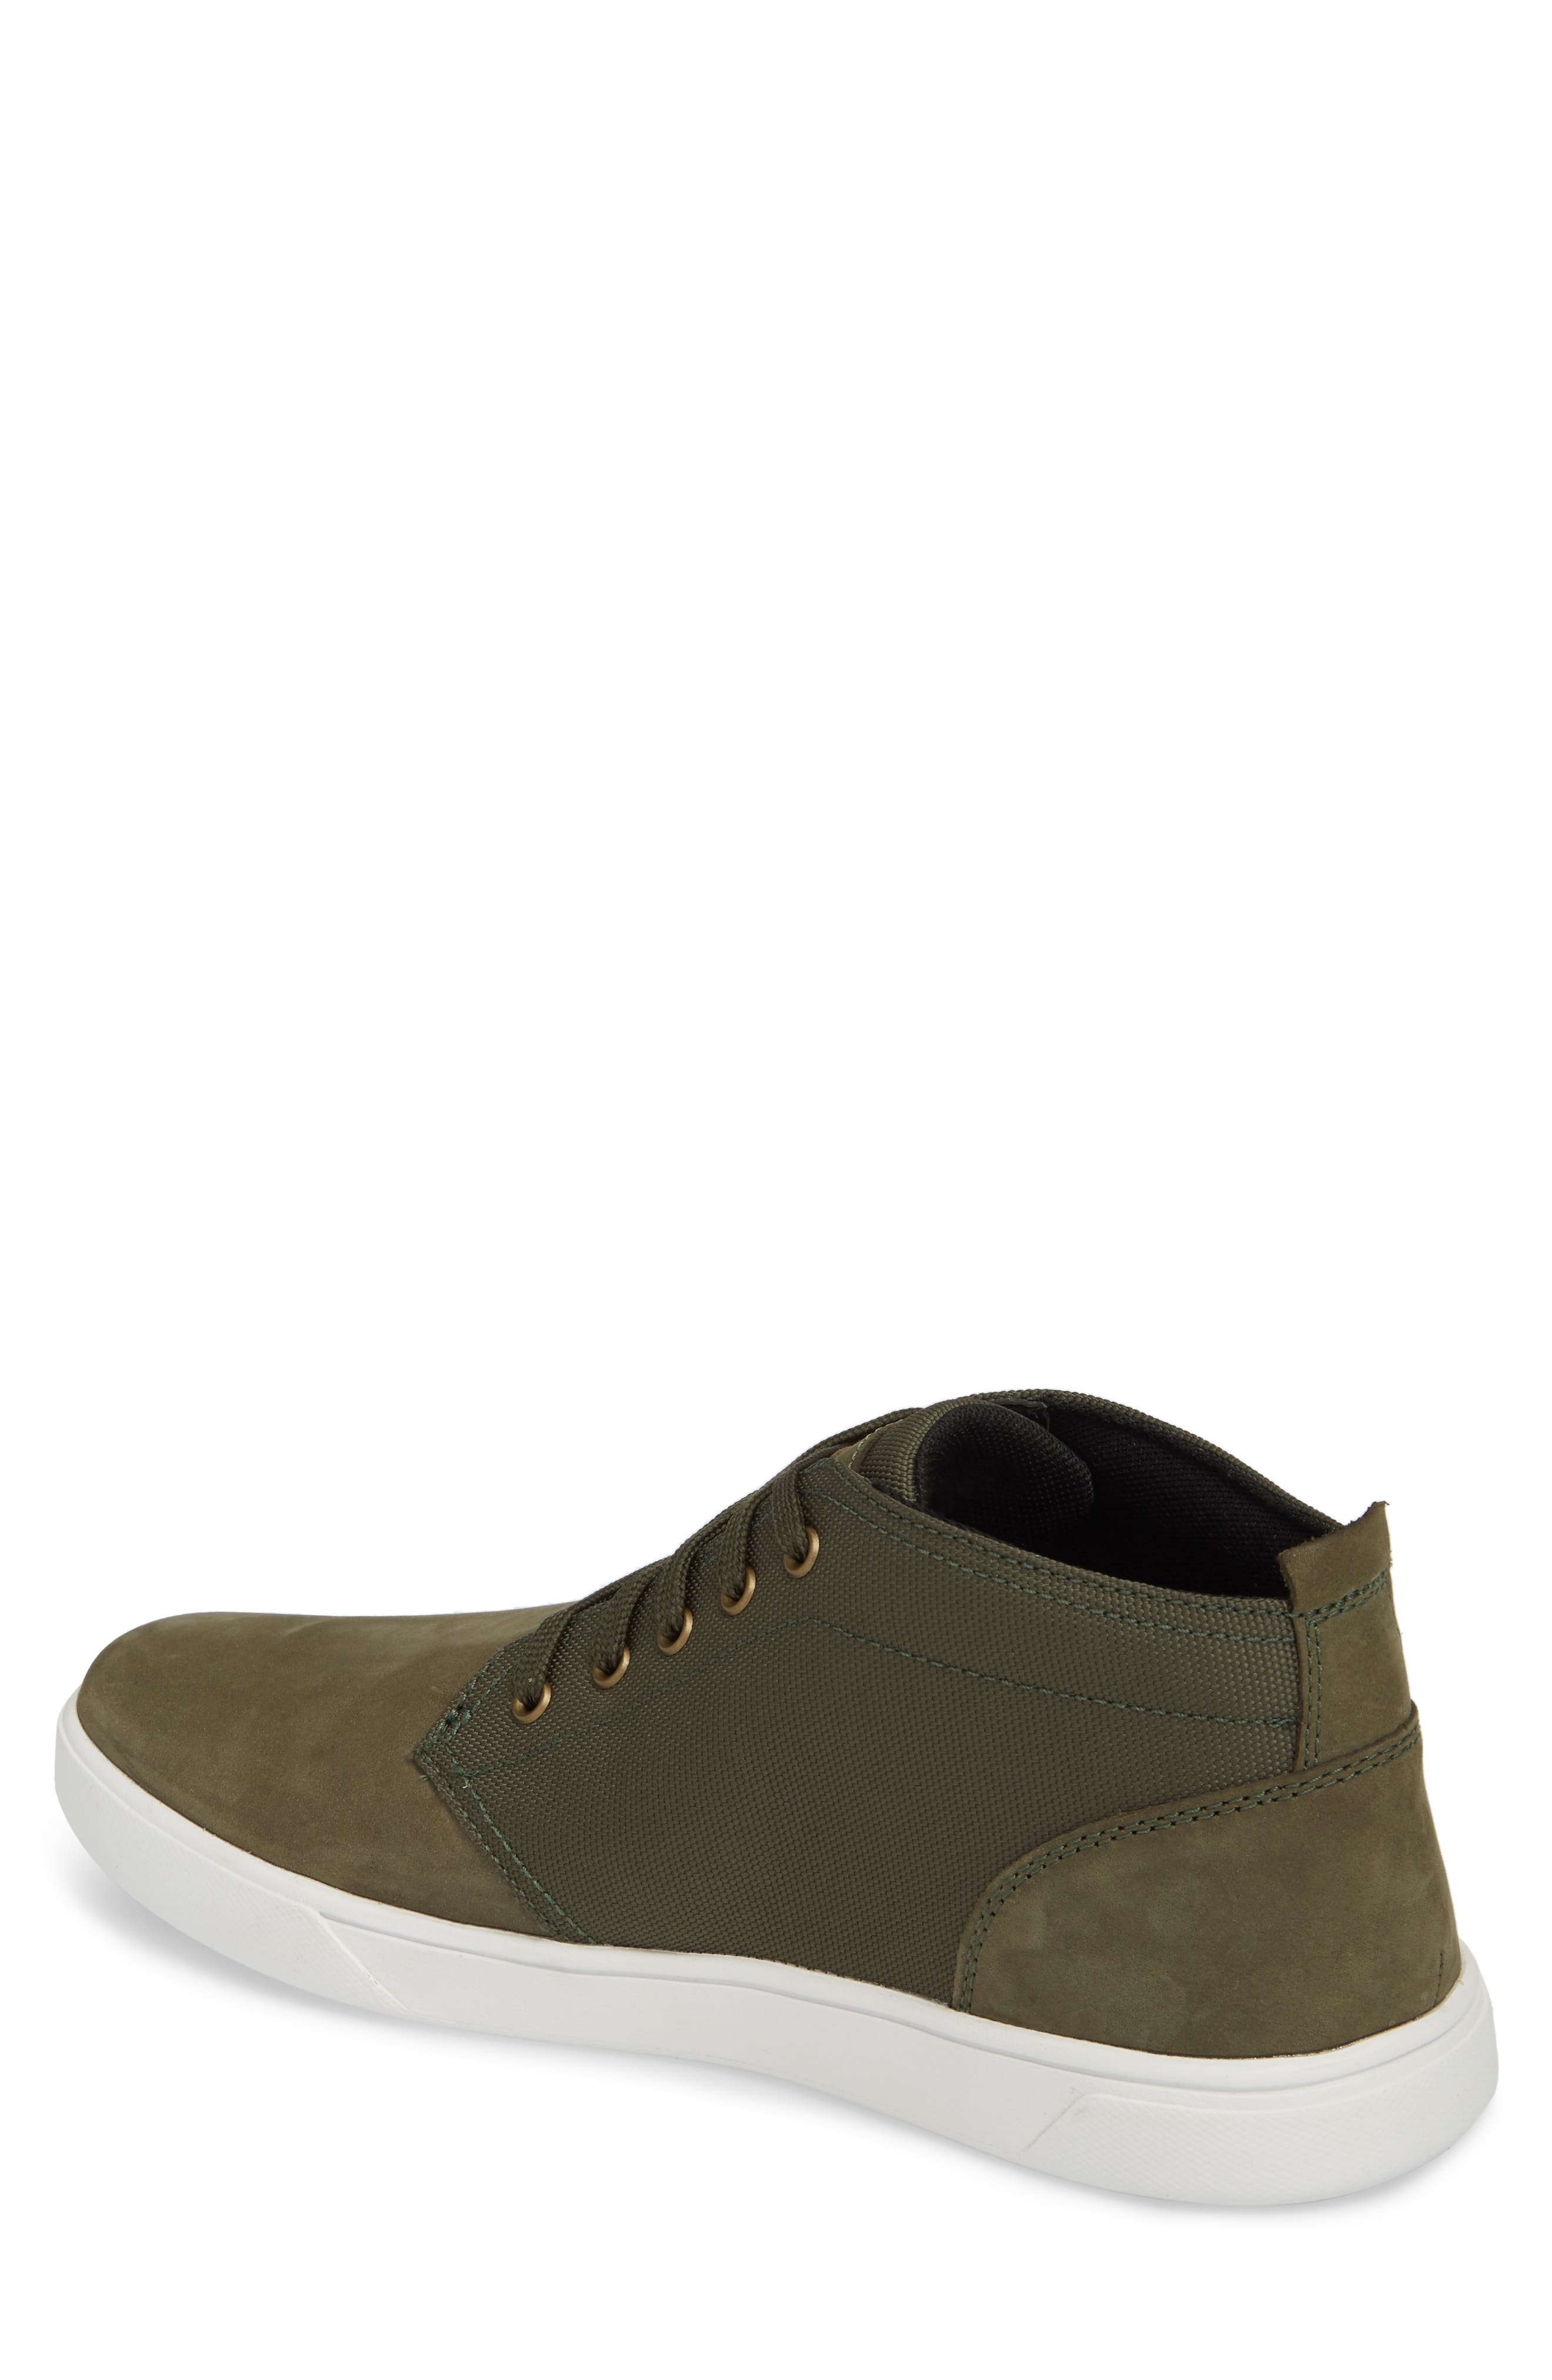 Earthkeepers<sup>®</sup> 'Groveton' Chukka Sneaker,                             Alternate thumbnail 2, color,                             Grape Leaf Leather